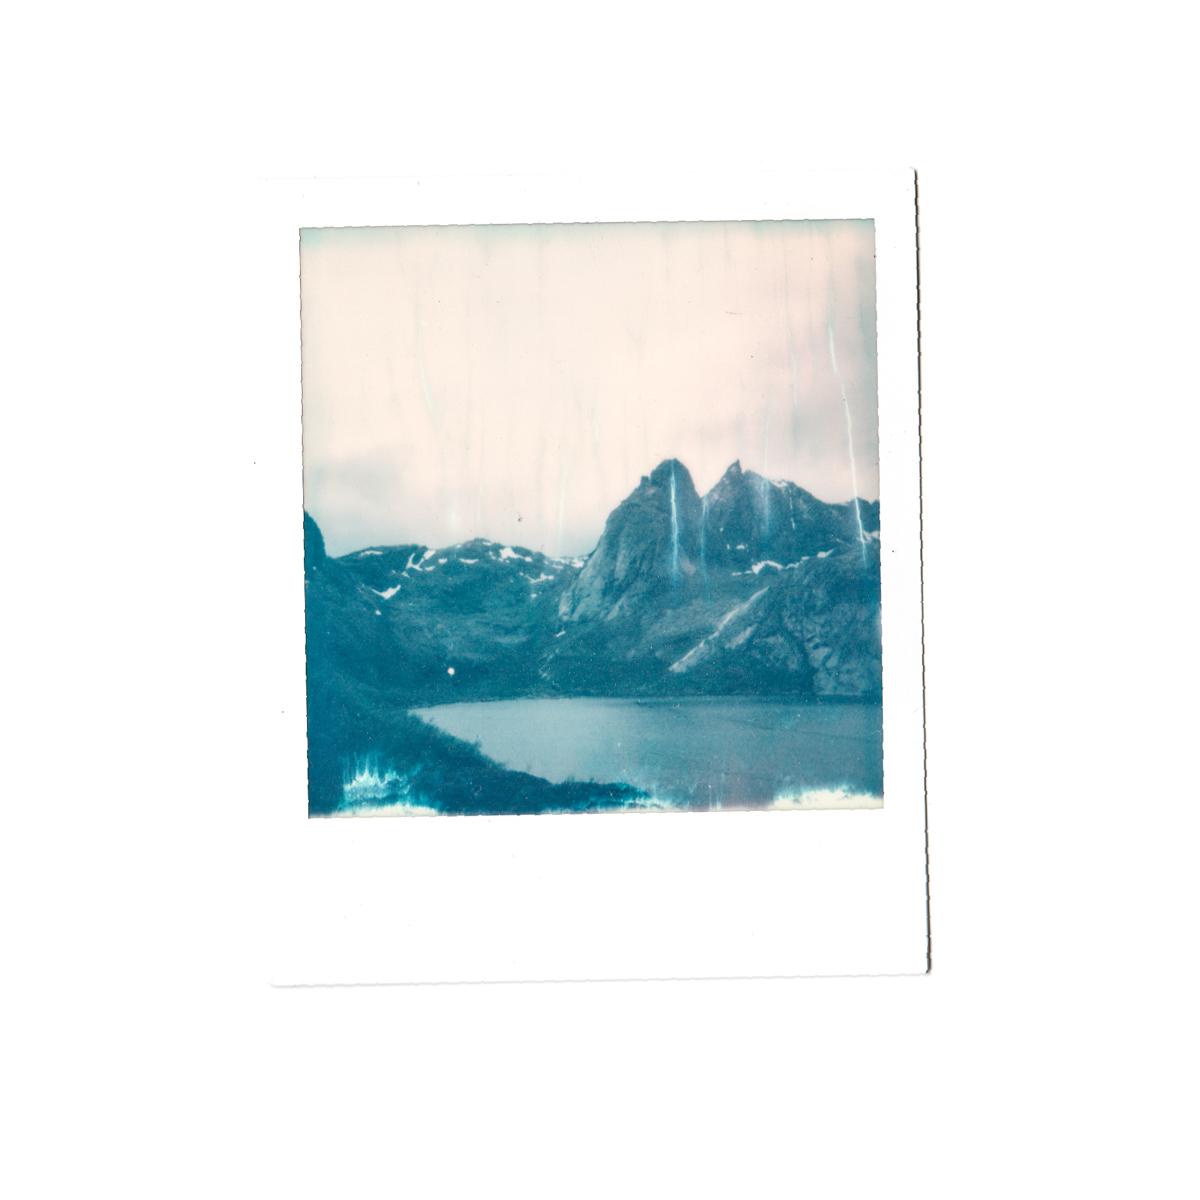 Magnolia_mountain_solvor_MT34-15.jpg